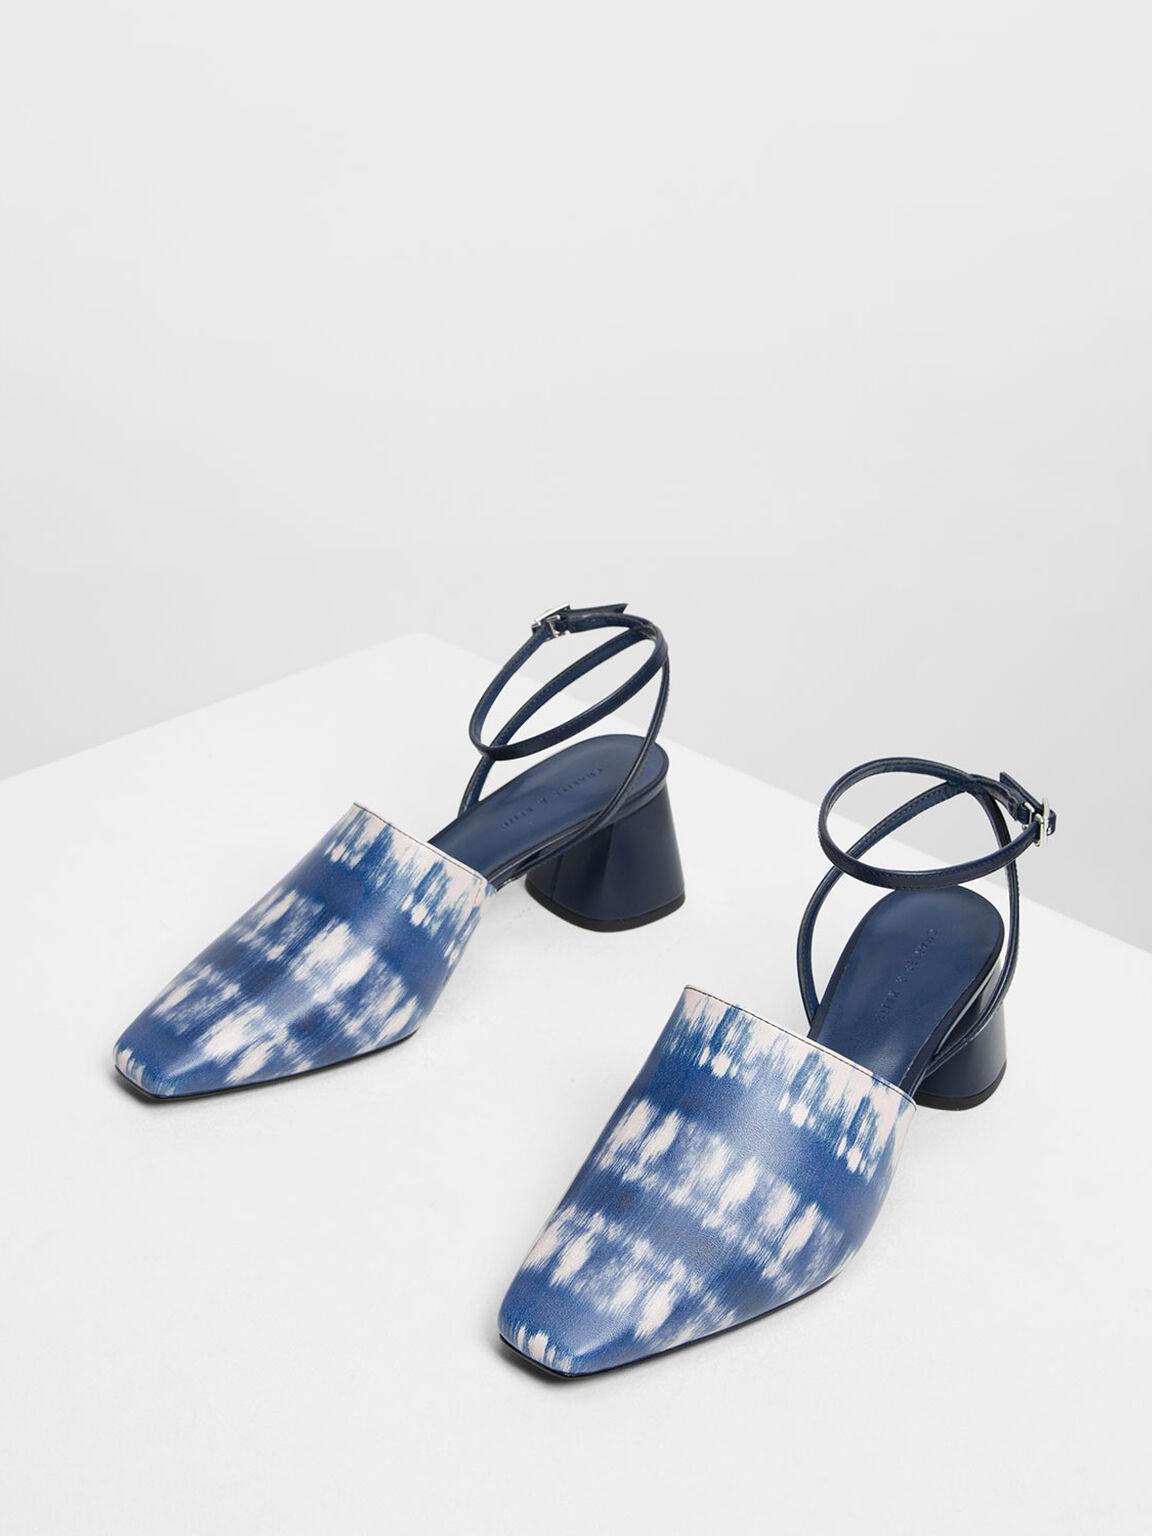 Closed Toe Block Heel Printed Sandals, Dark Blue, hi-res